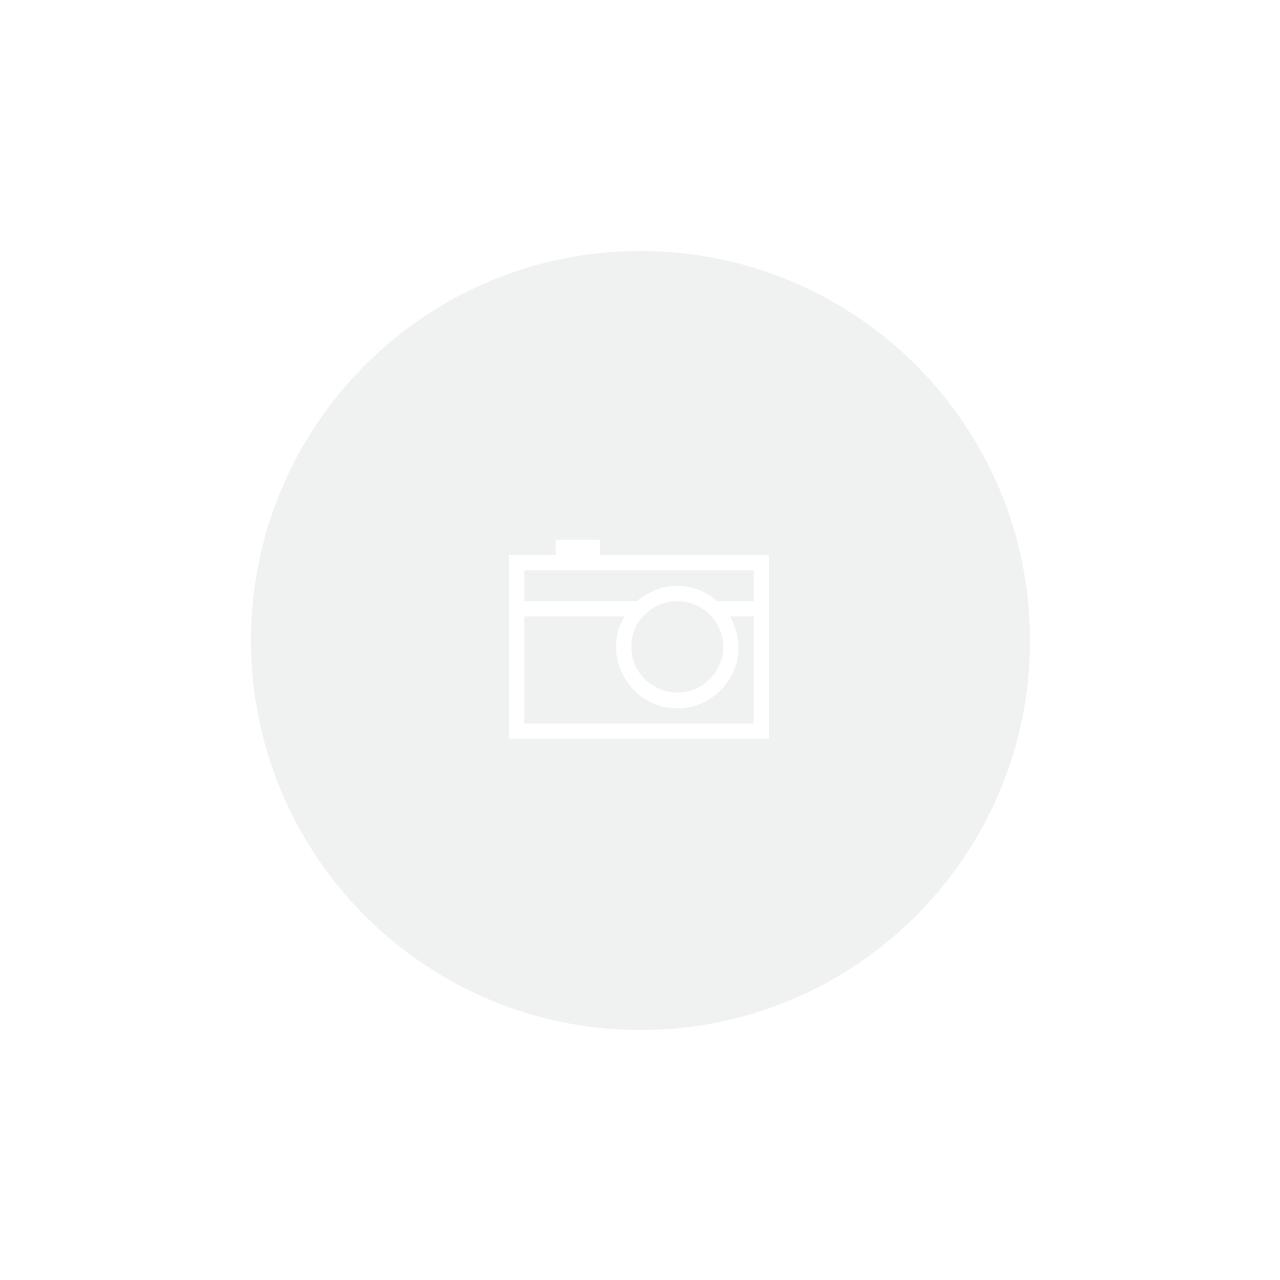 Bandeja Retangular Branco 30 cm